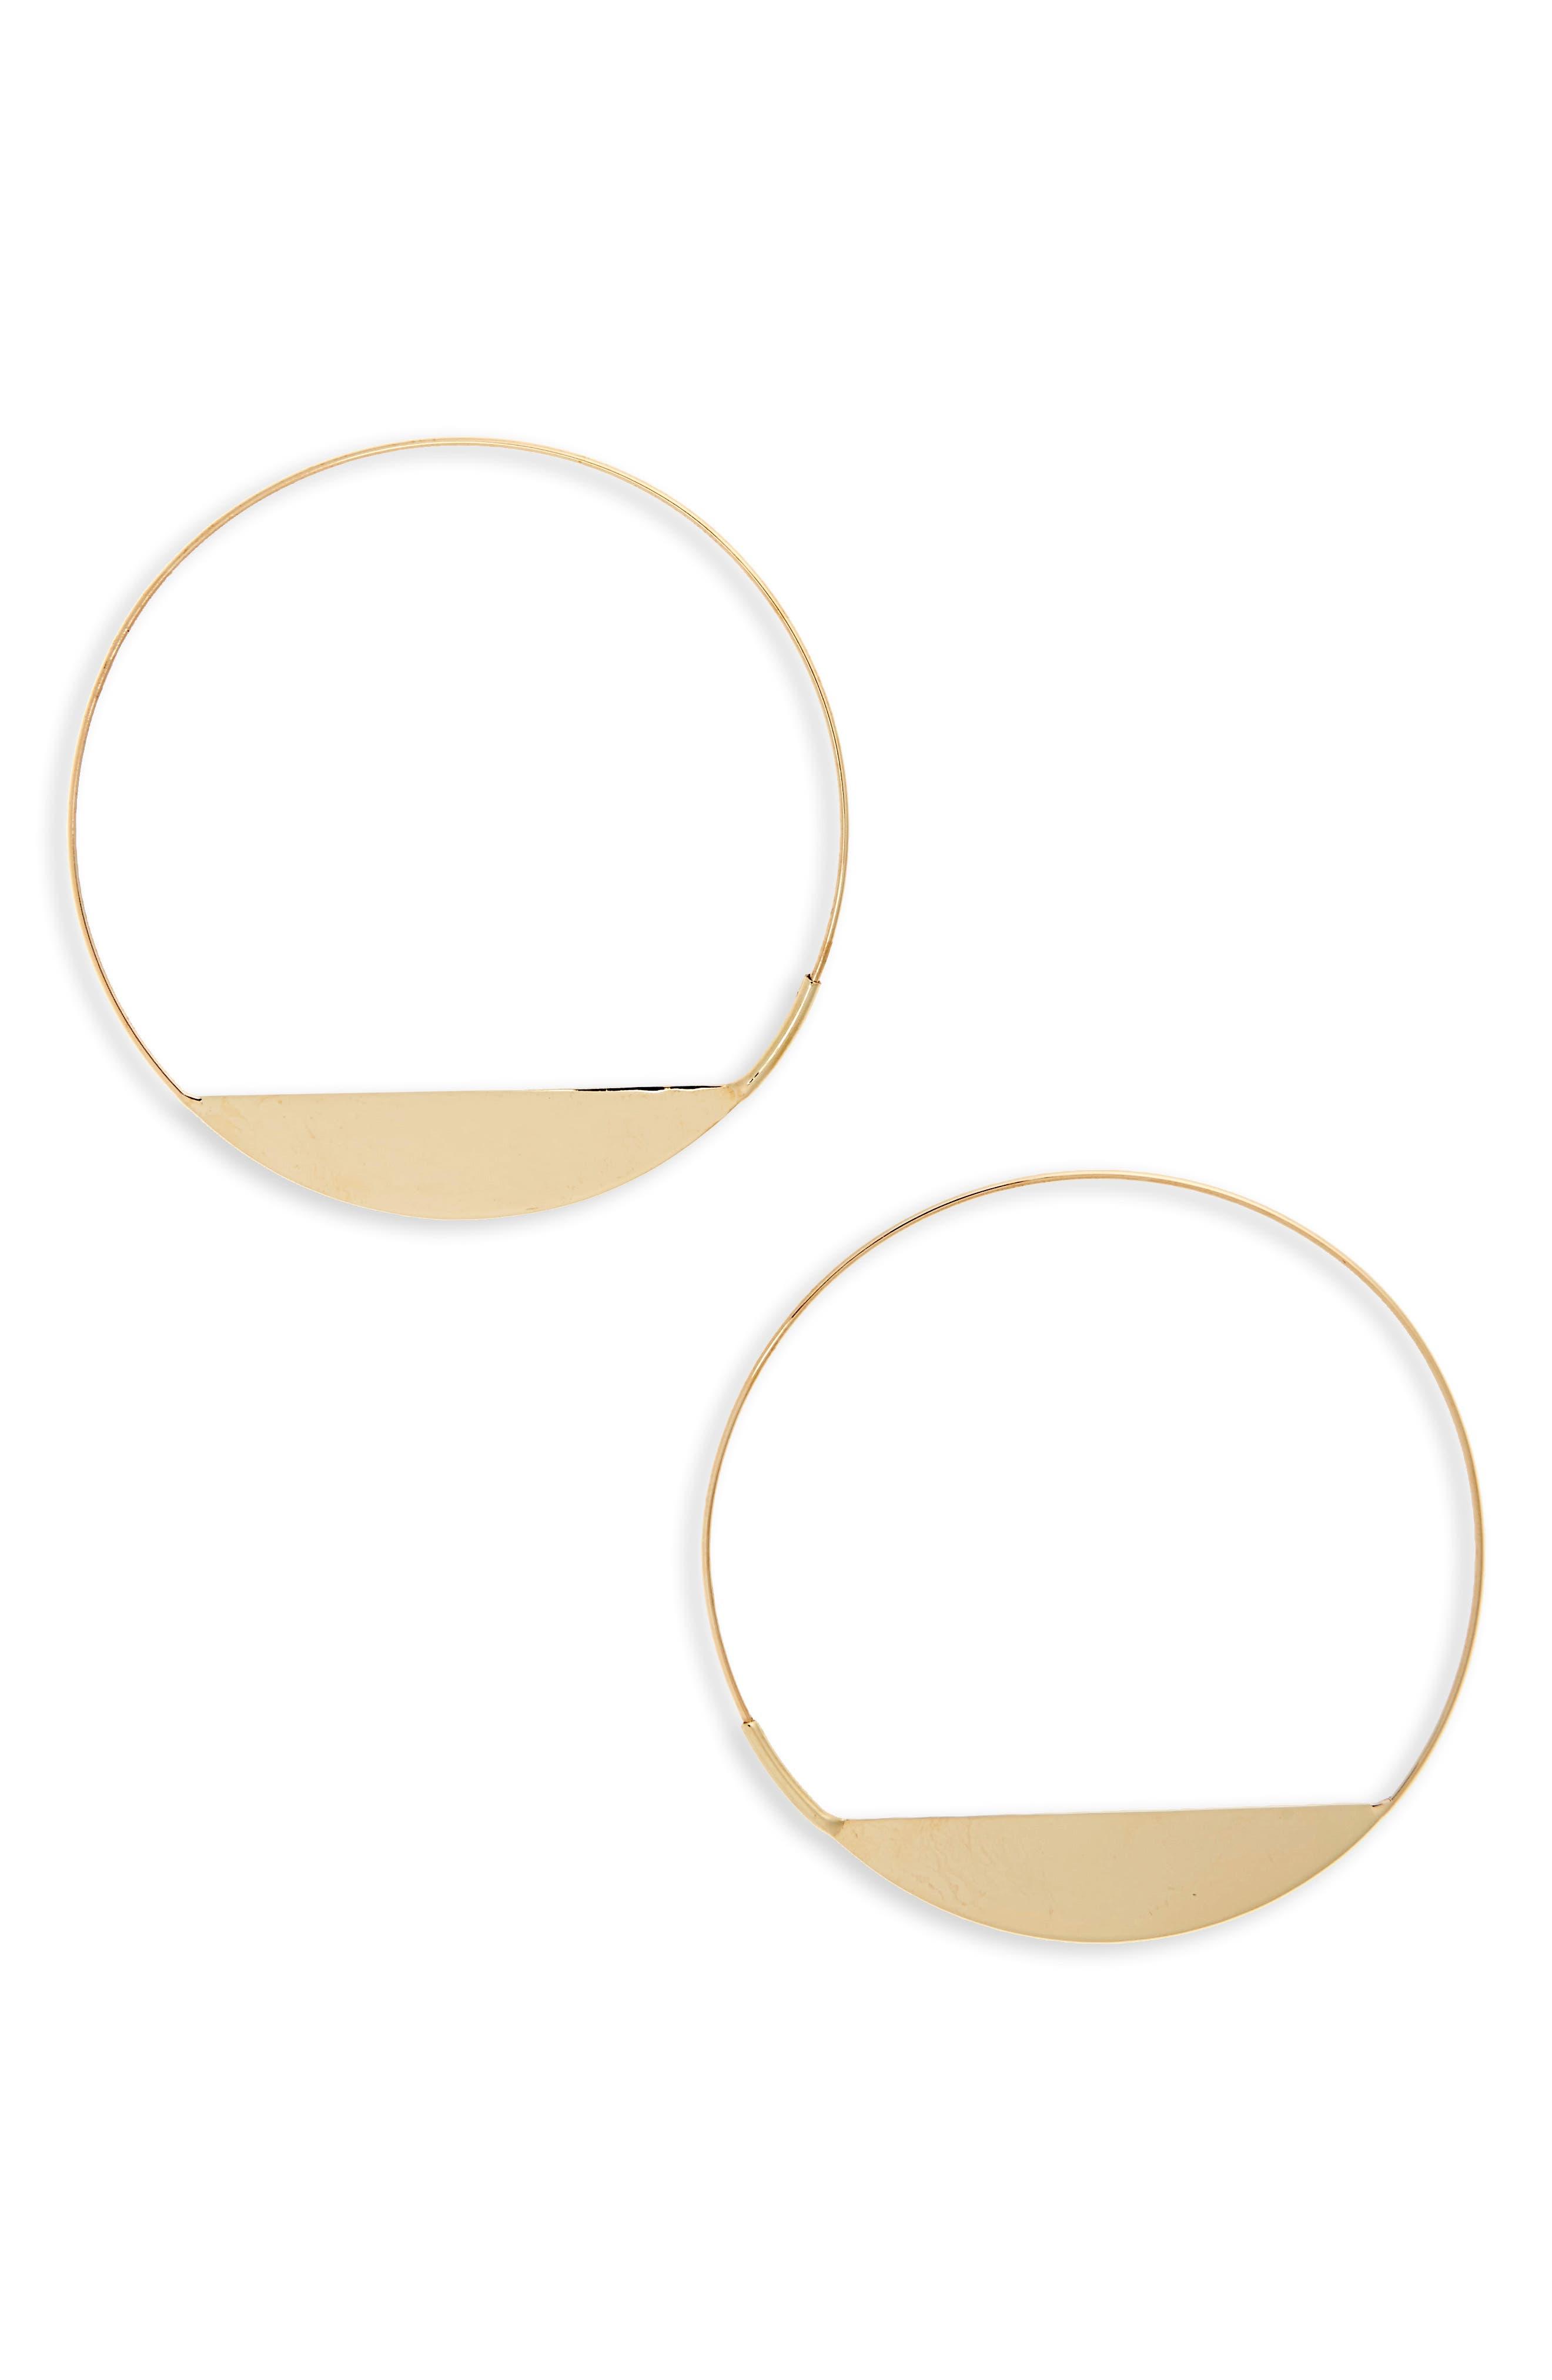 Lana Jewelry Eclipse Magic Hoop